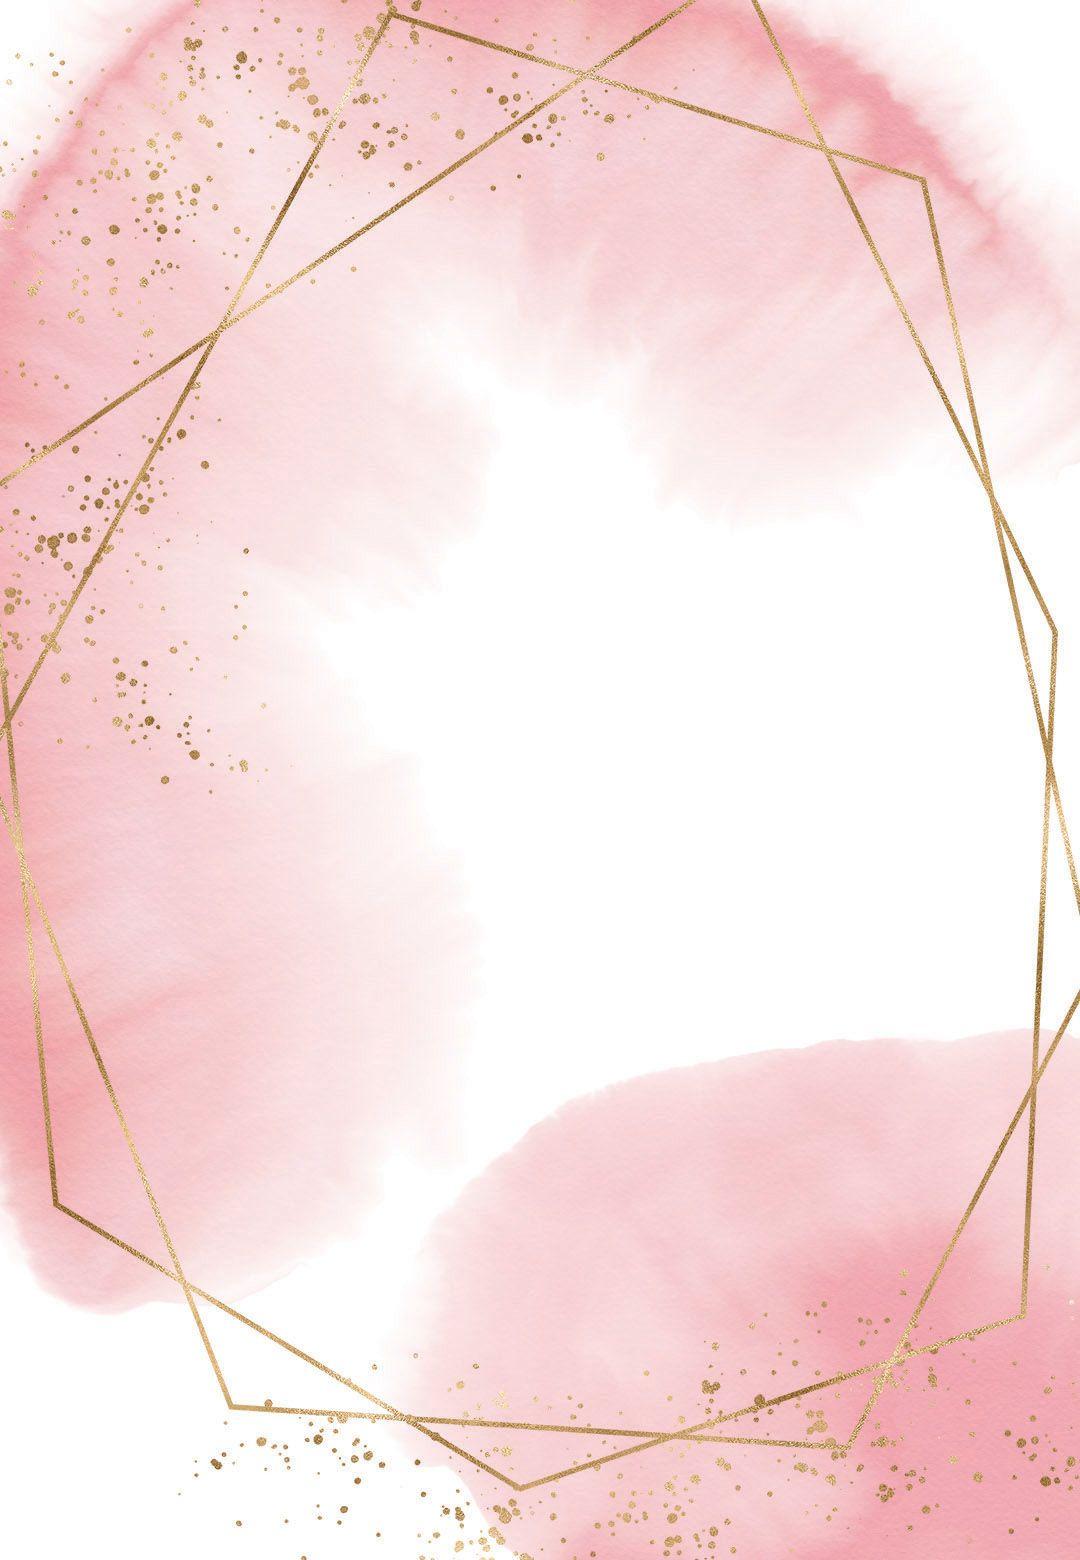 Gold polygon - Sweet 16 Invitation Template | Greetings Island